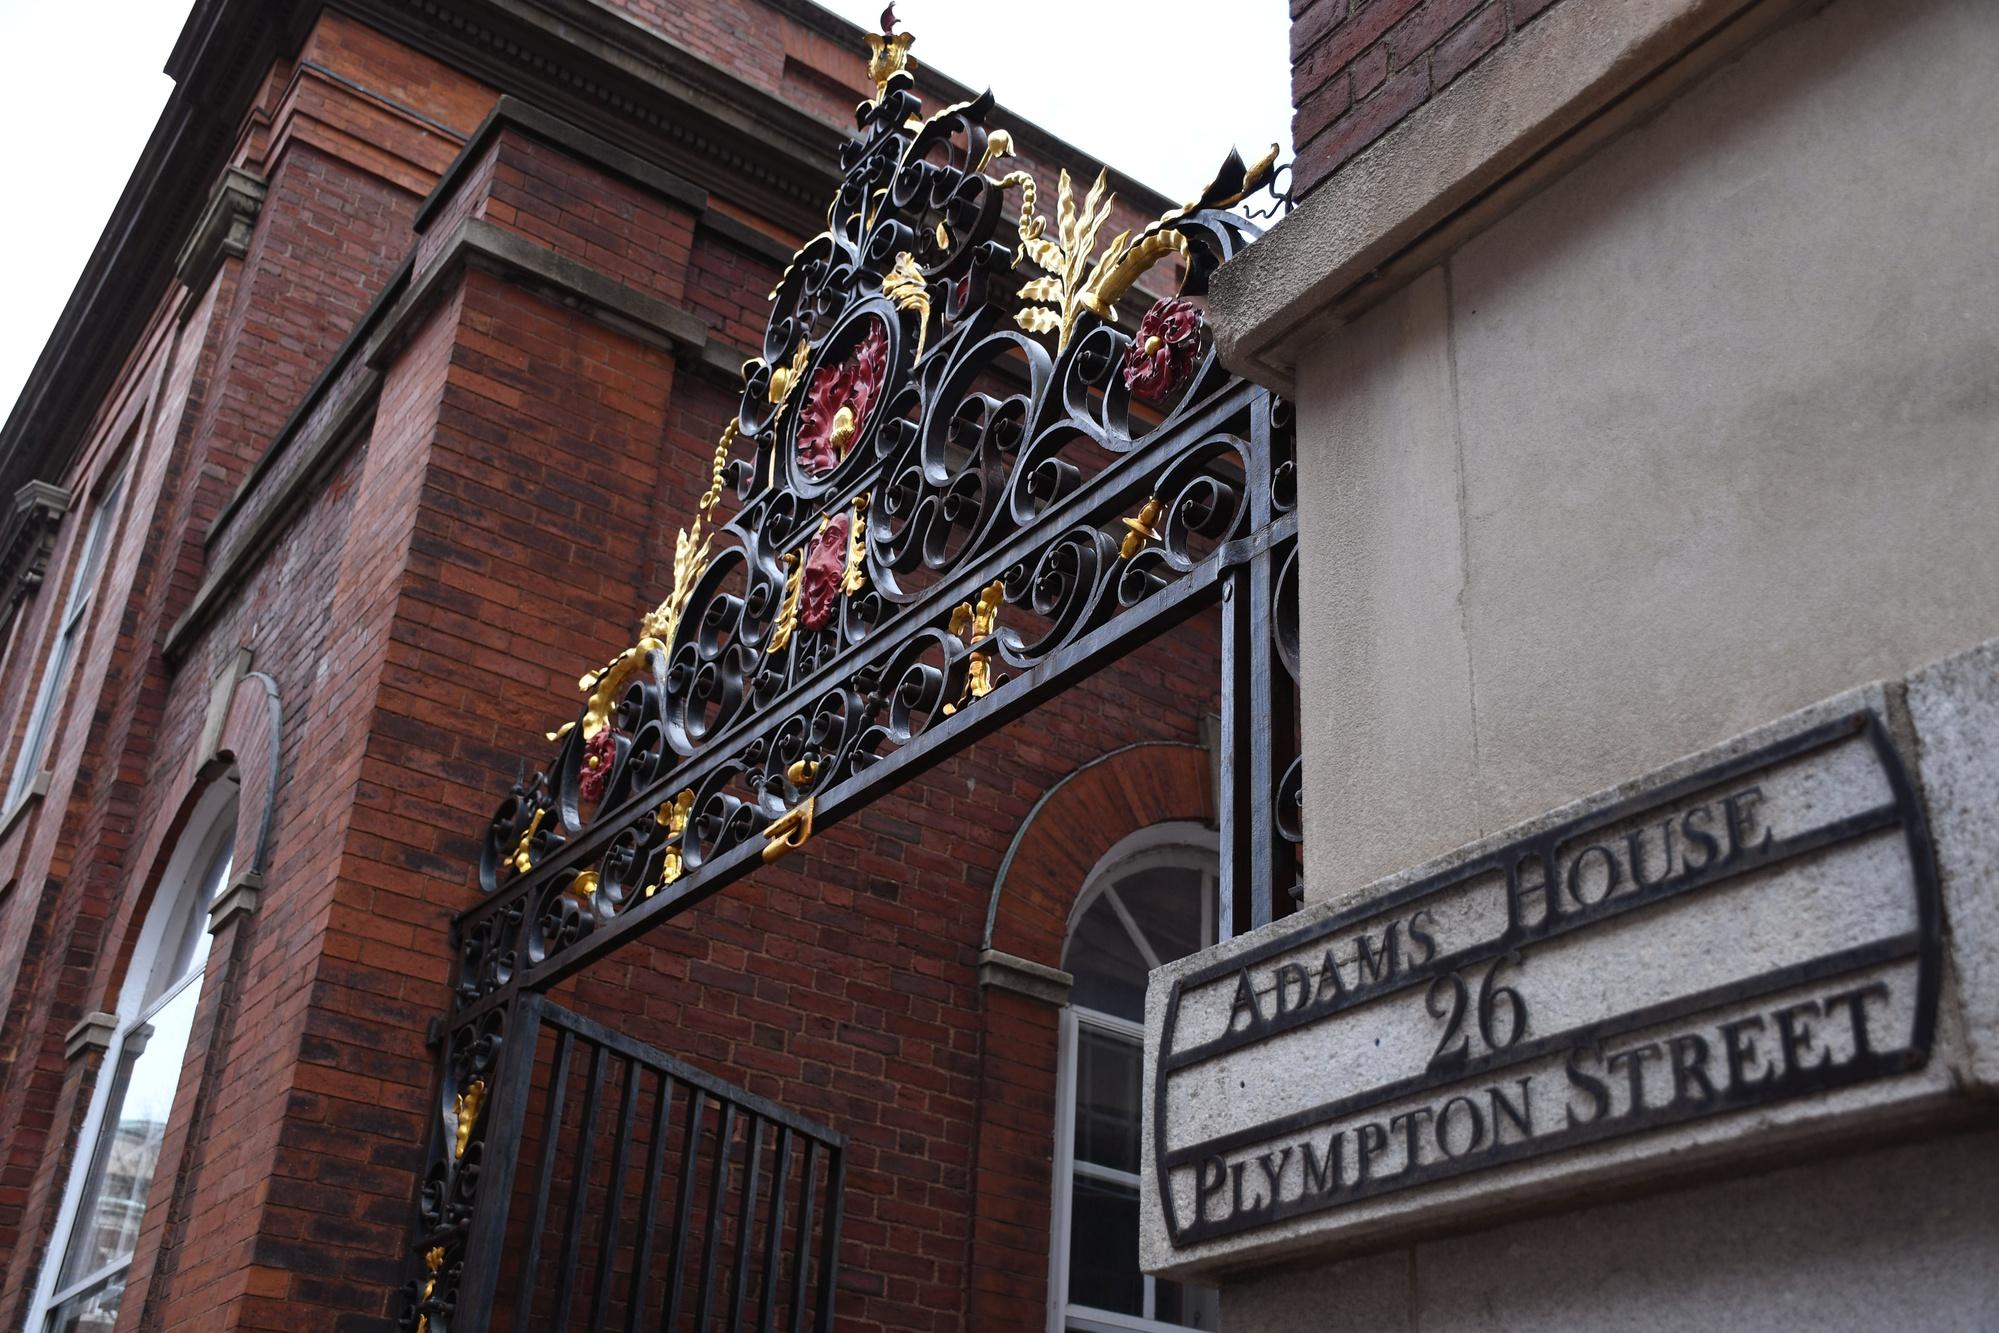 Adams House's gate.